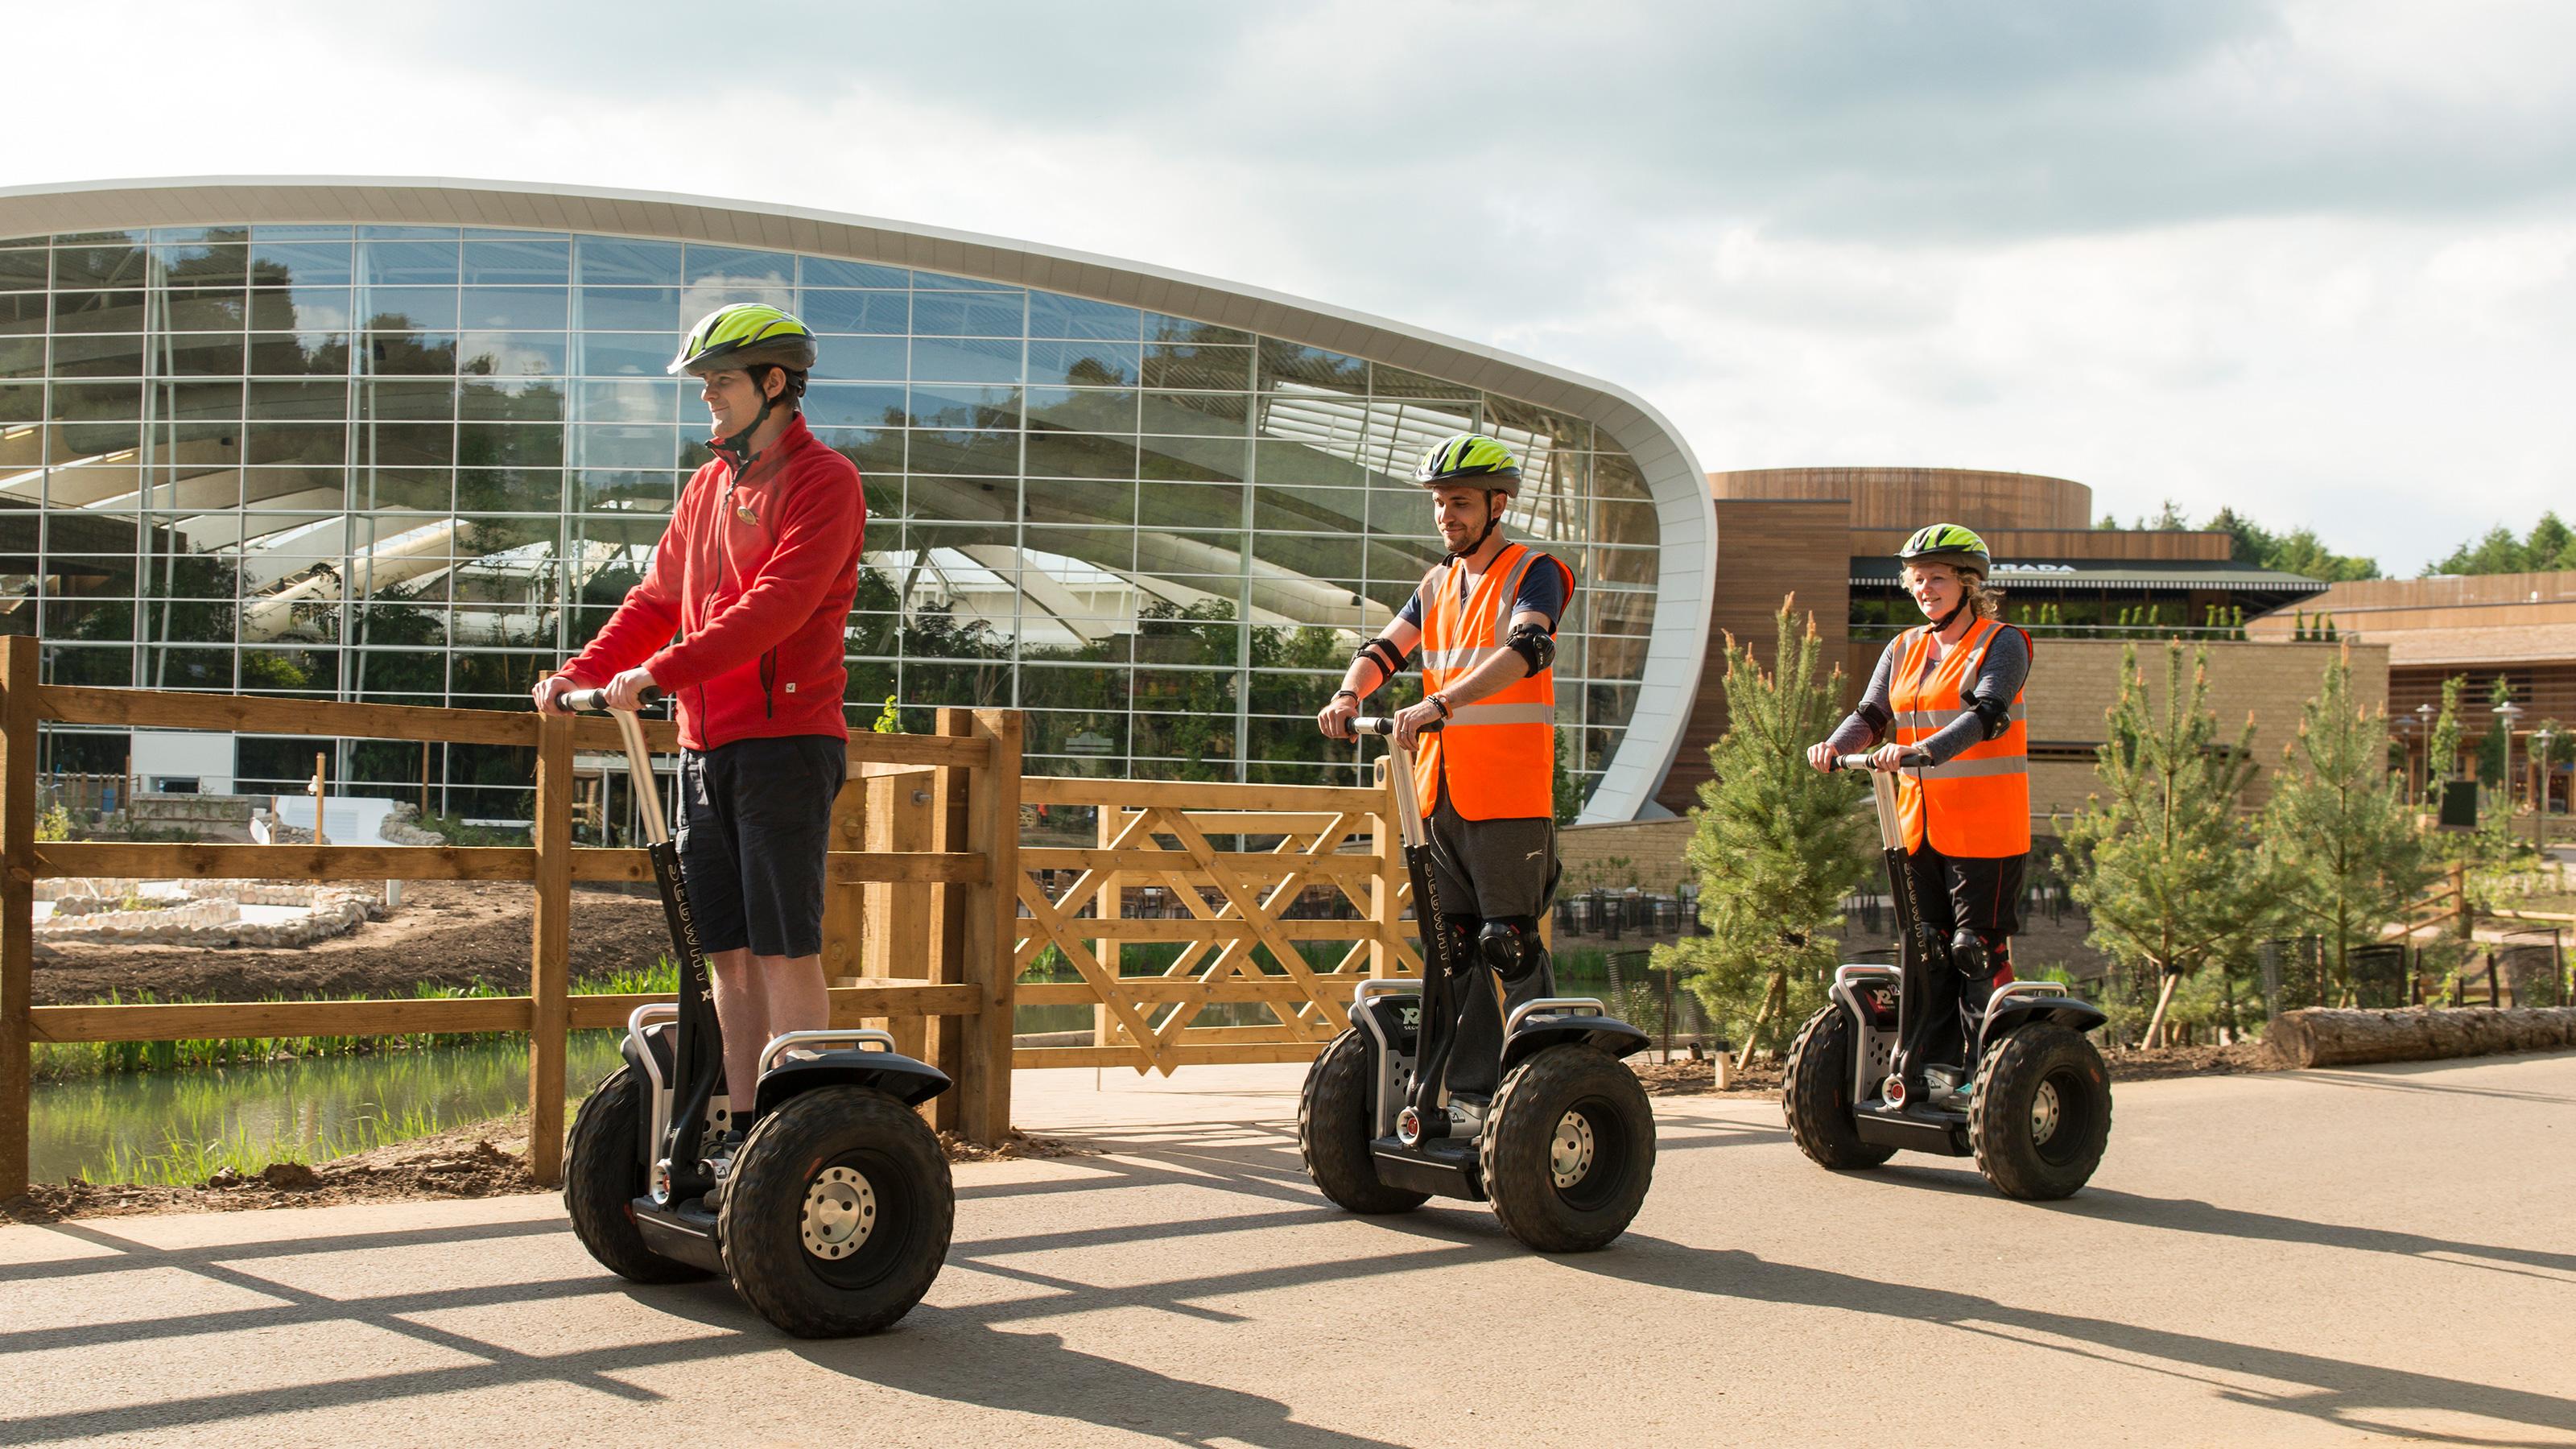 Segway PT's tilt at electric transport revolution comes to an end